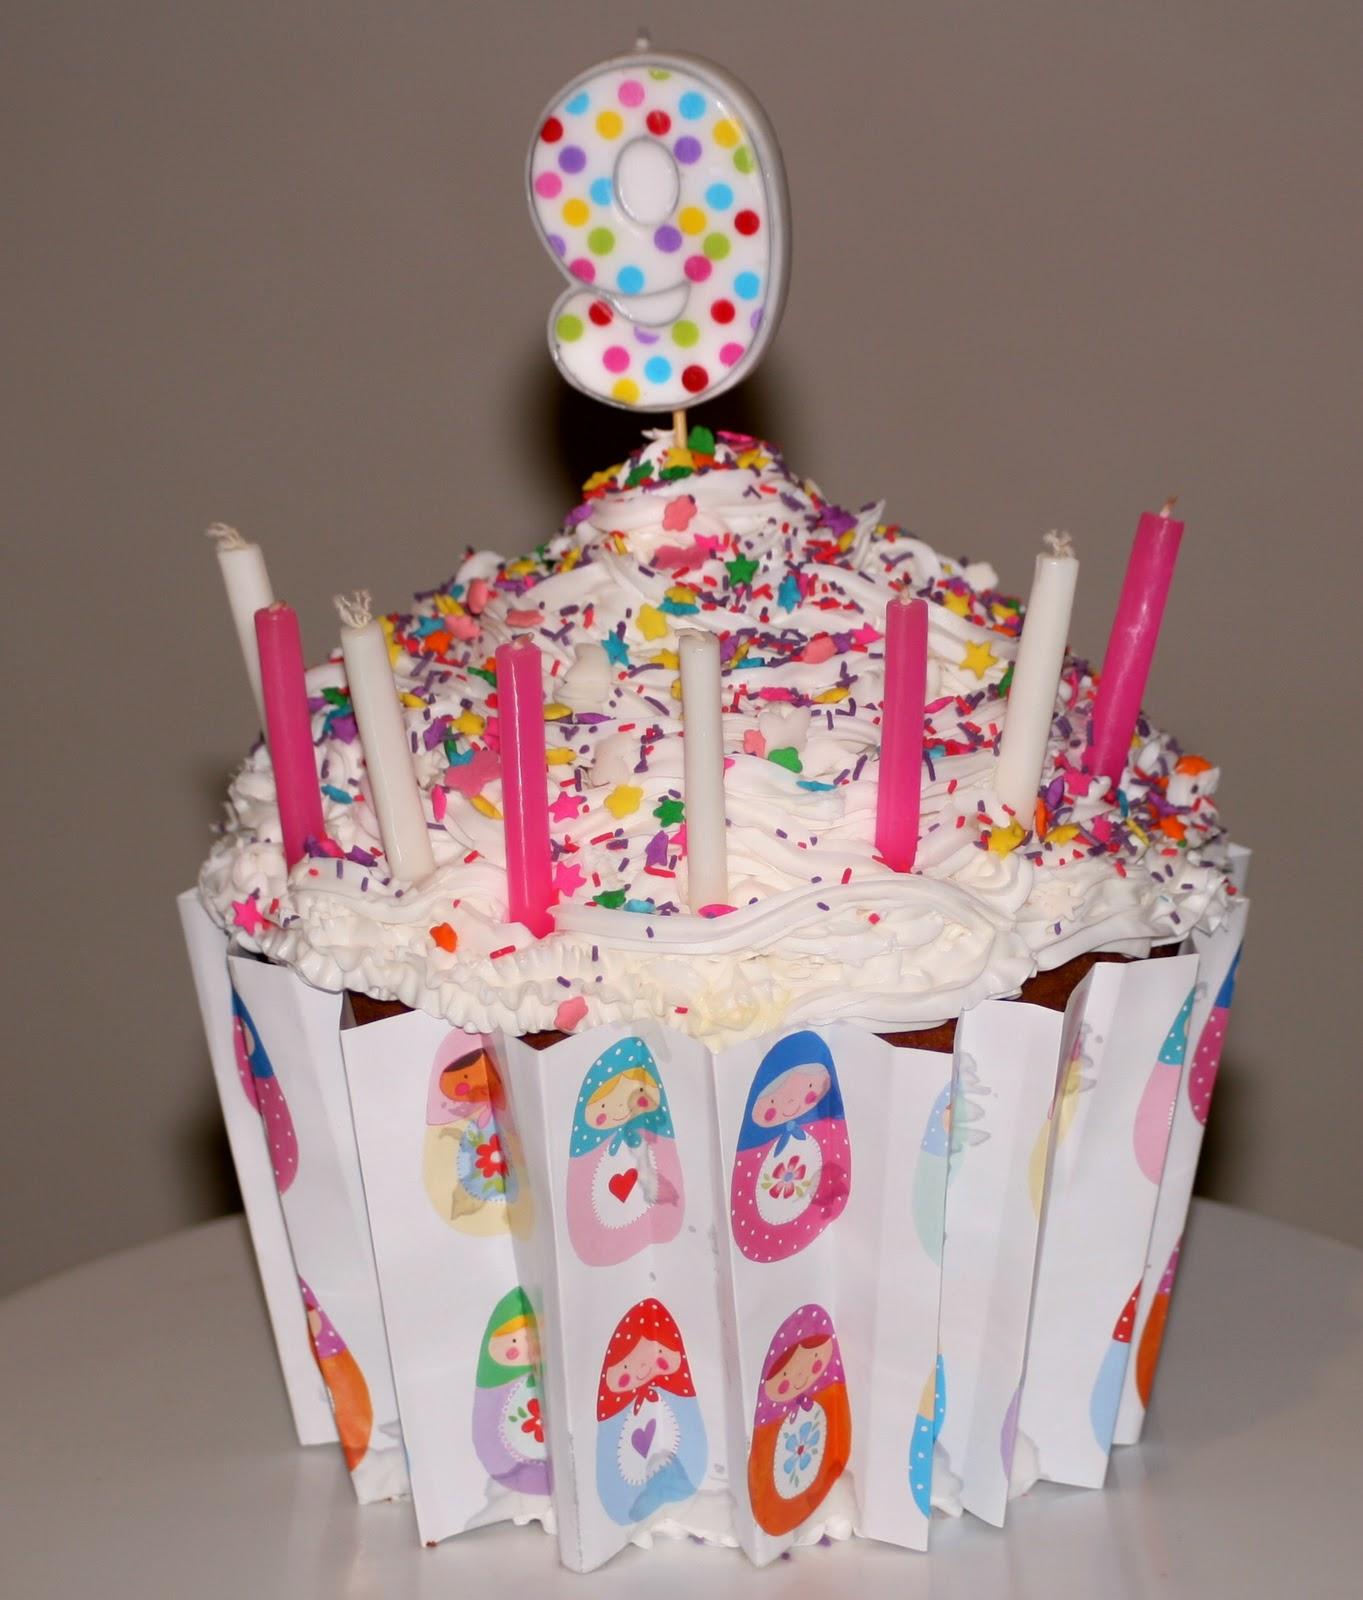 http://1.bp.blogspot.com/_4TmmMcICFFo/TVBxfeuaFVI/AAAAAAAAA98/VHsRkBSe_Dk/s1600/maddy+cake+1.jpg